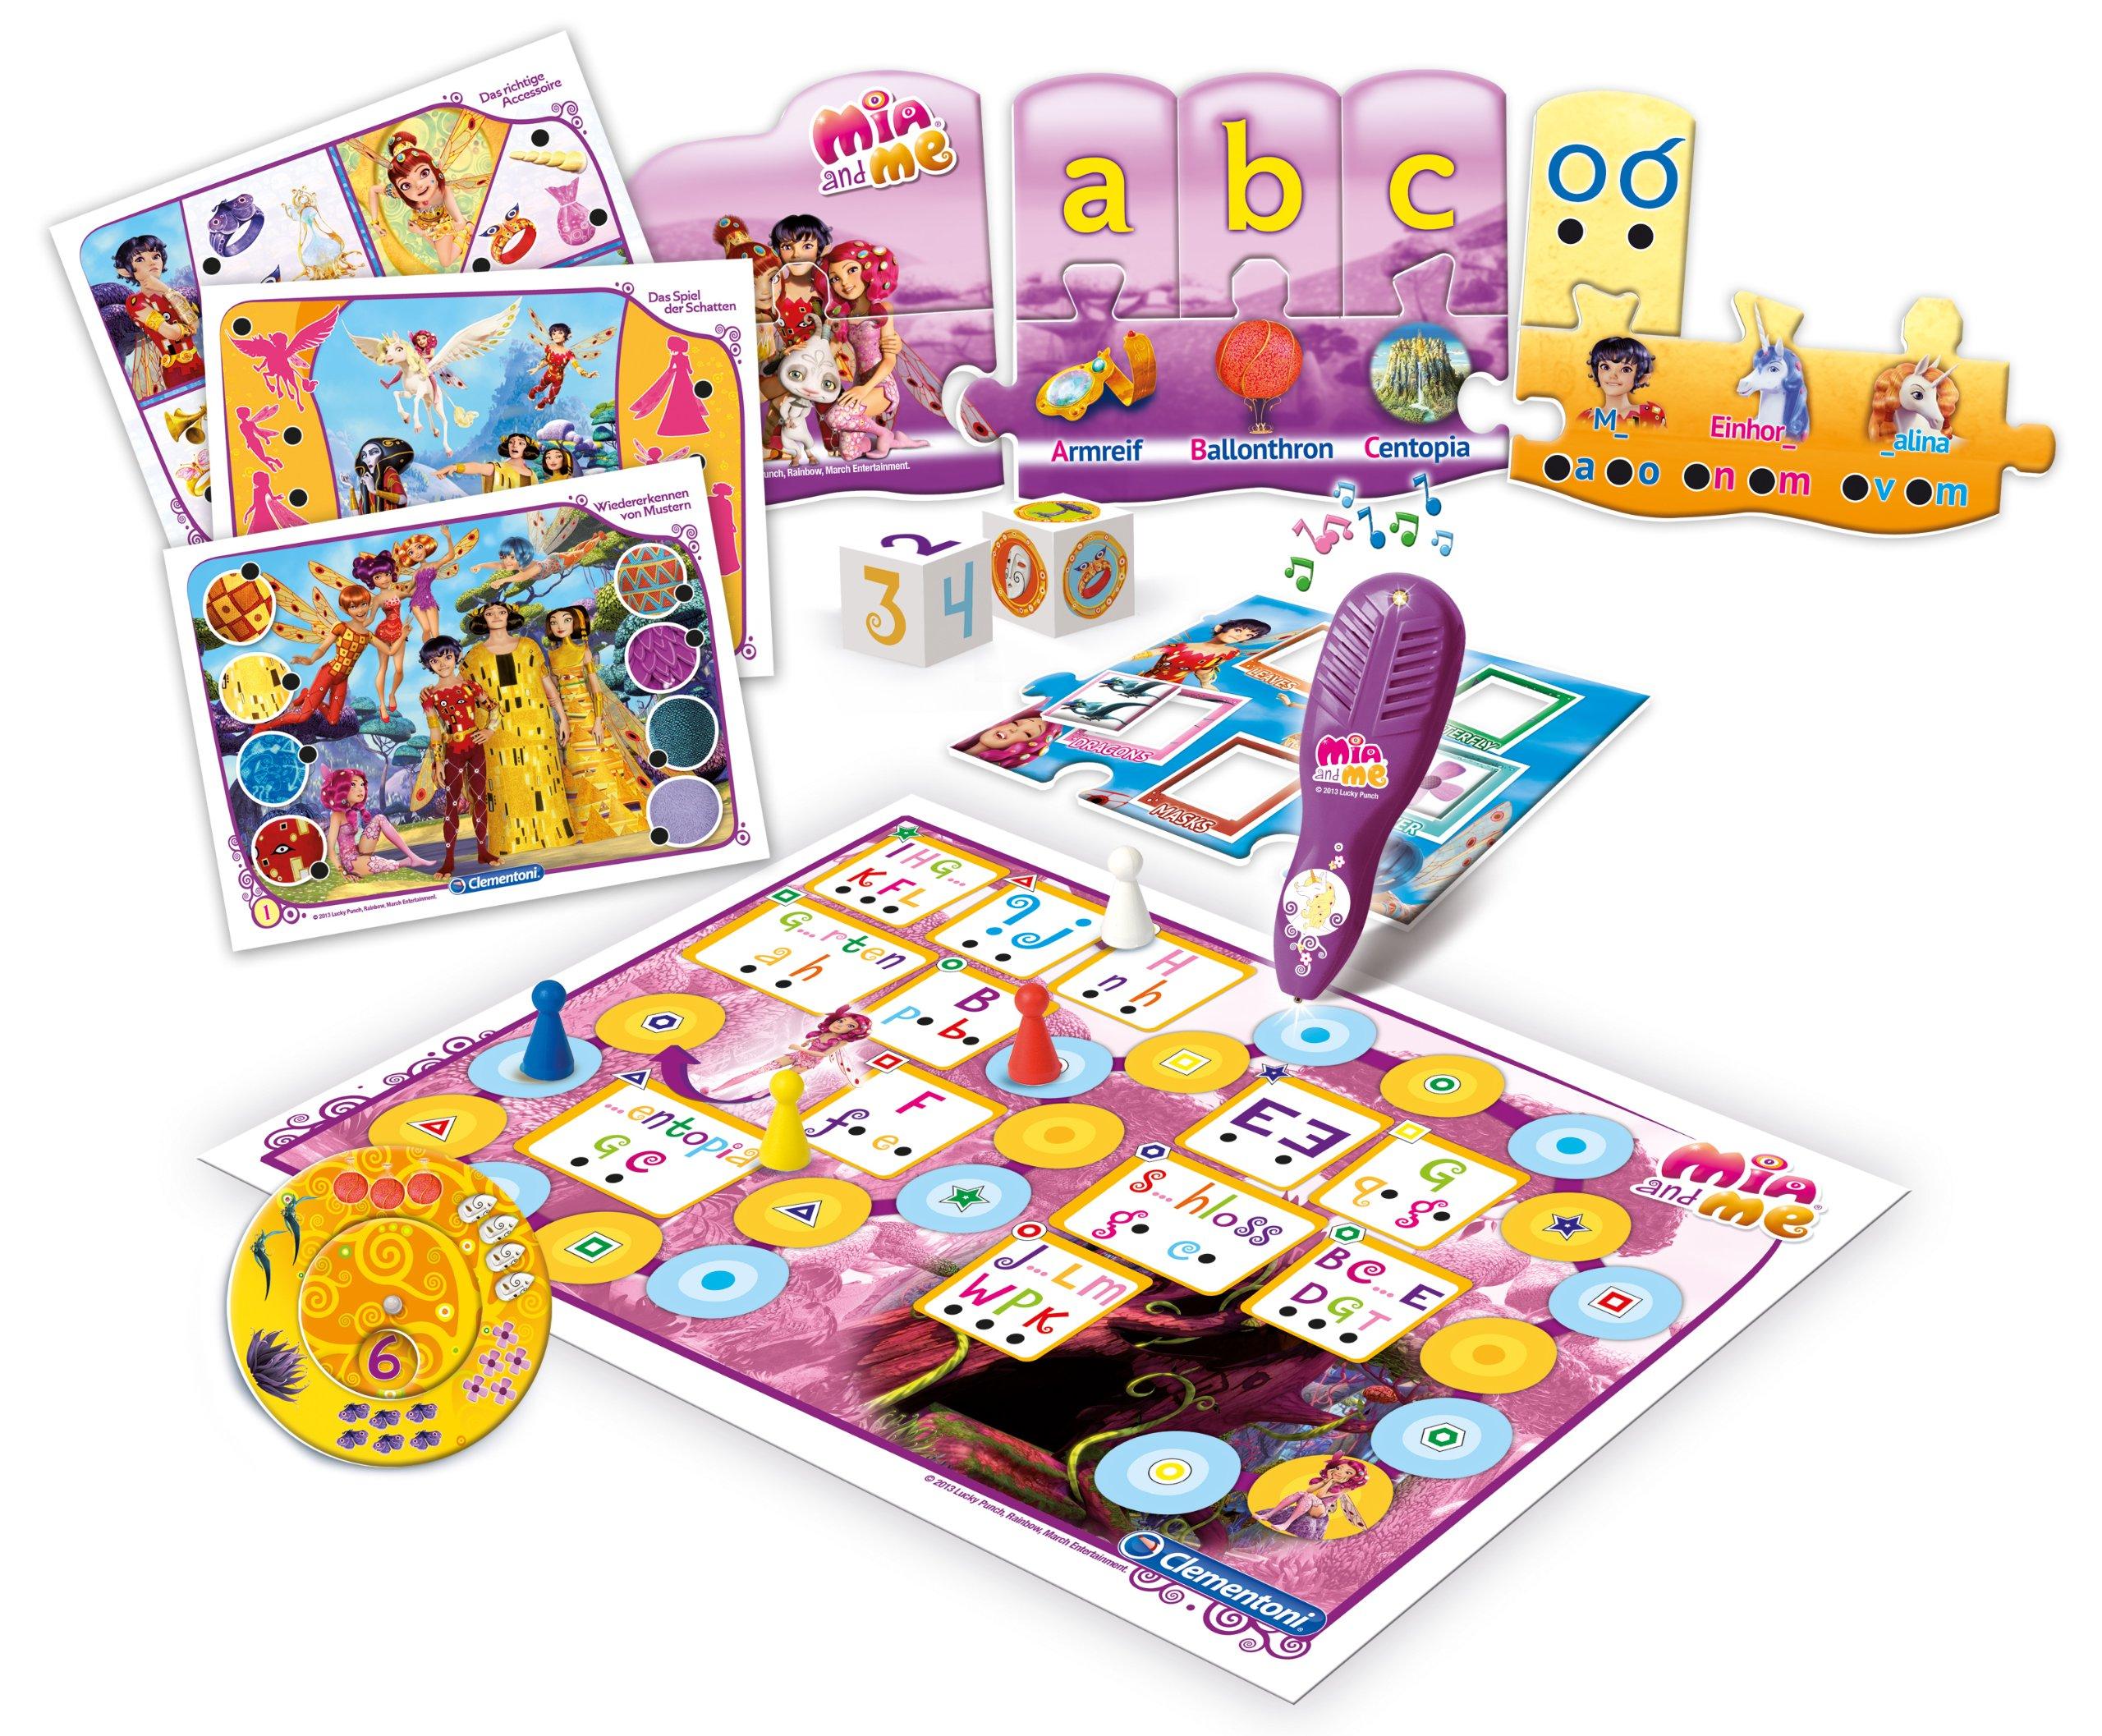 Clementoni-691821-20-Spiele-in-1-Mia-und-me